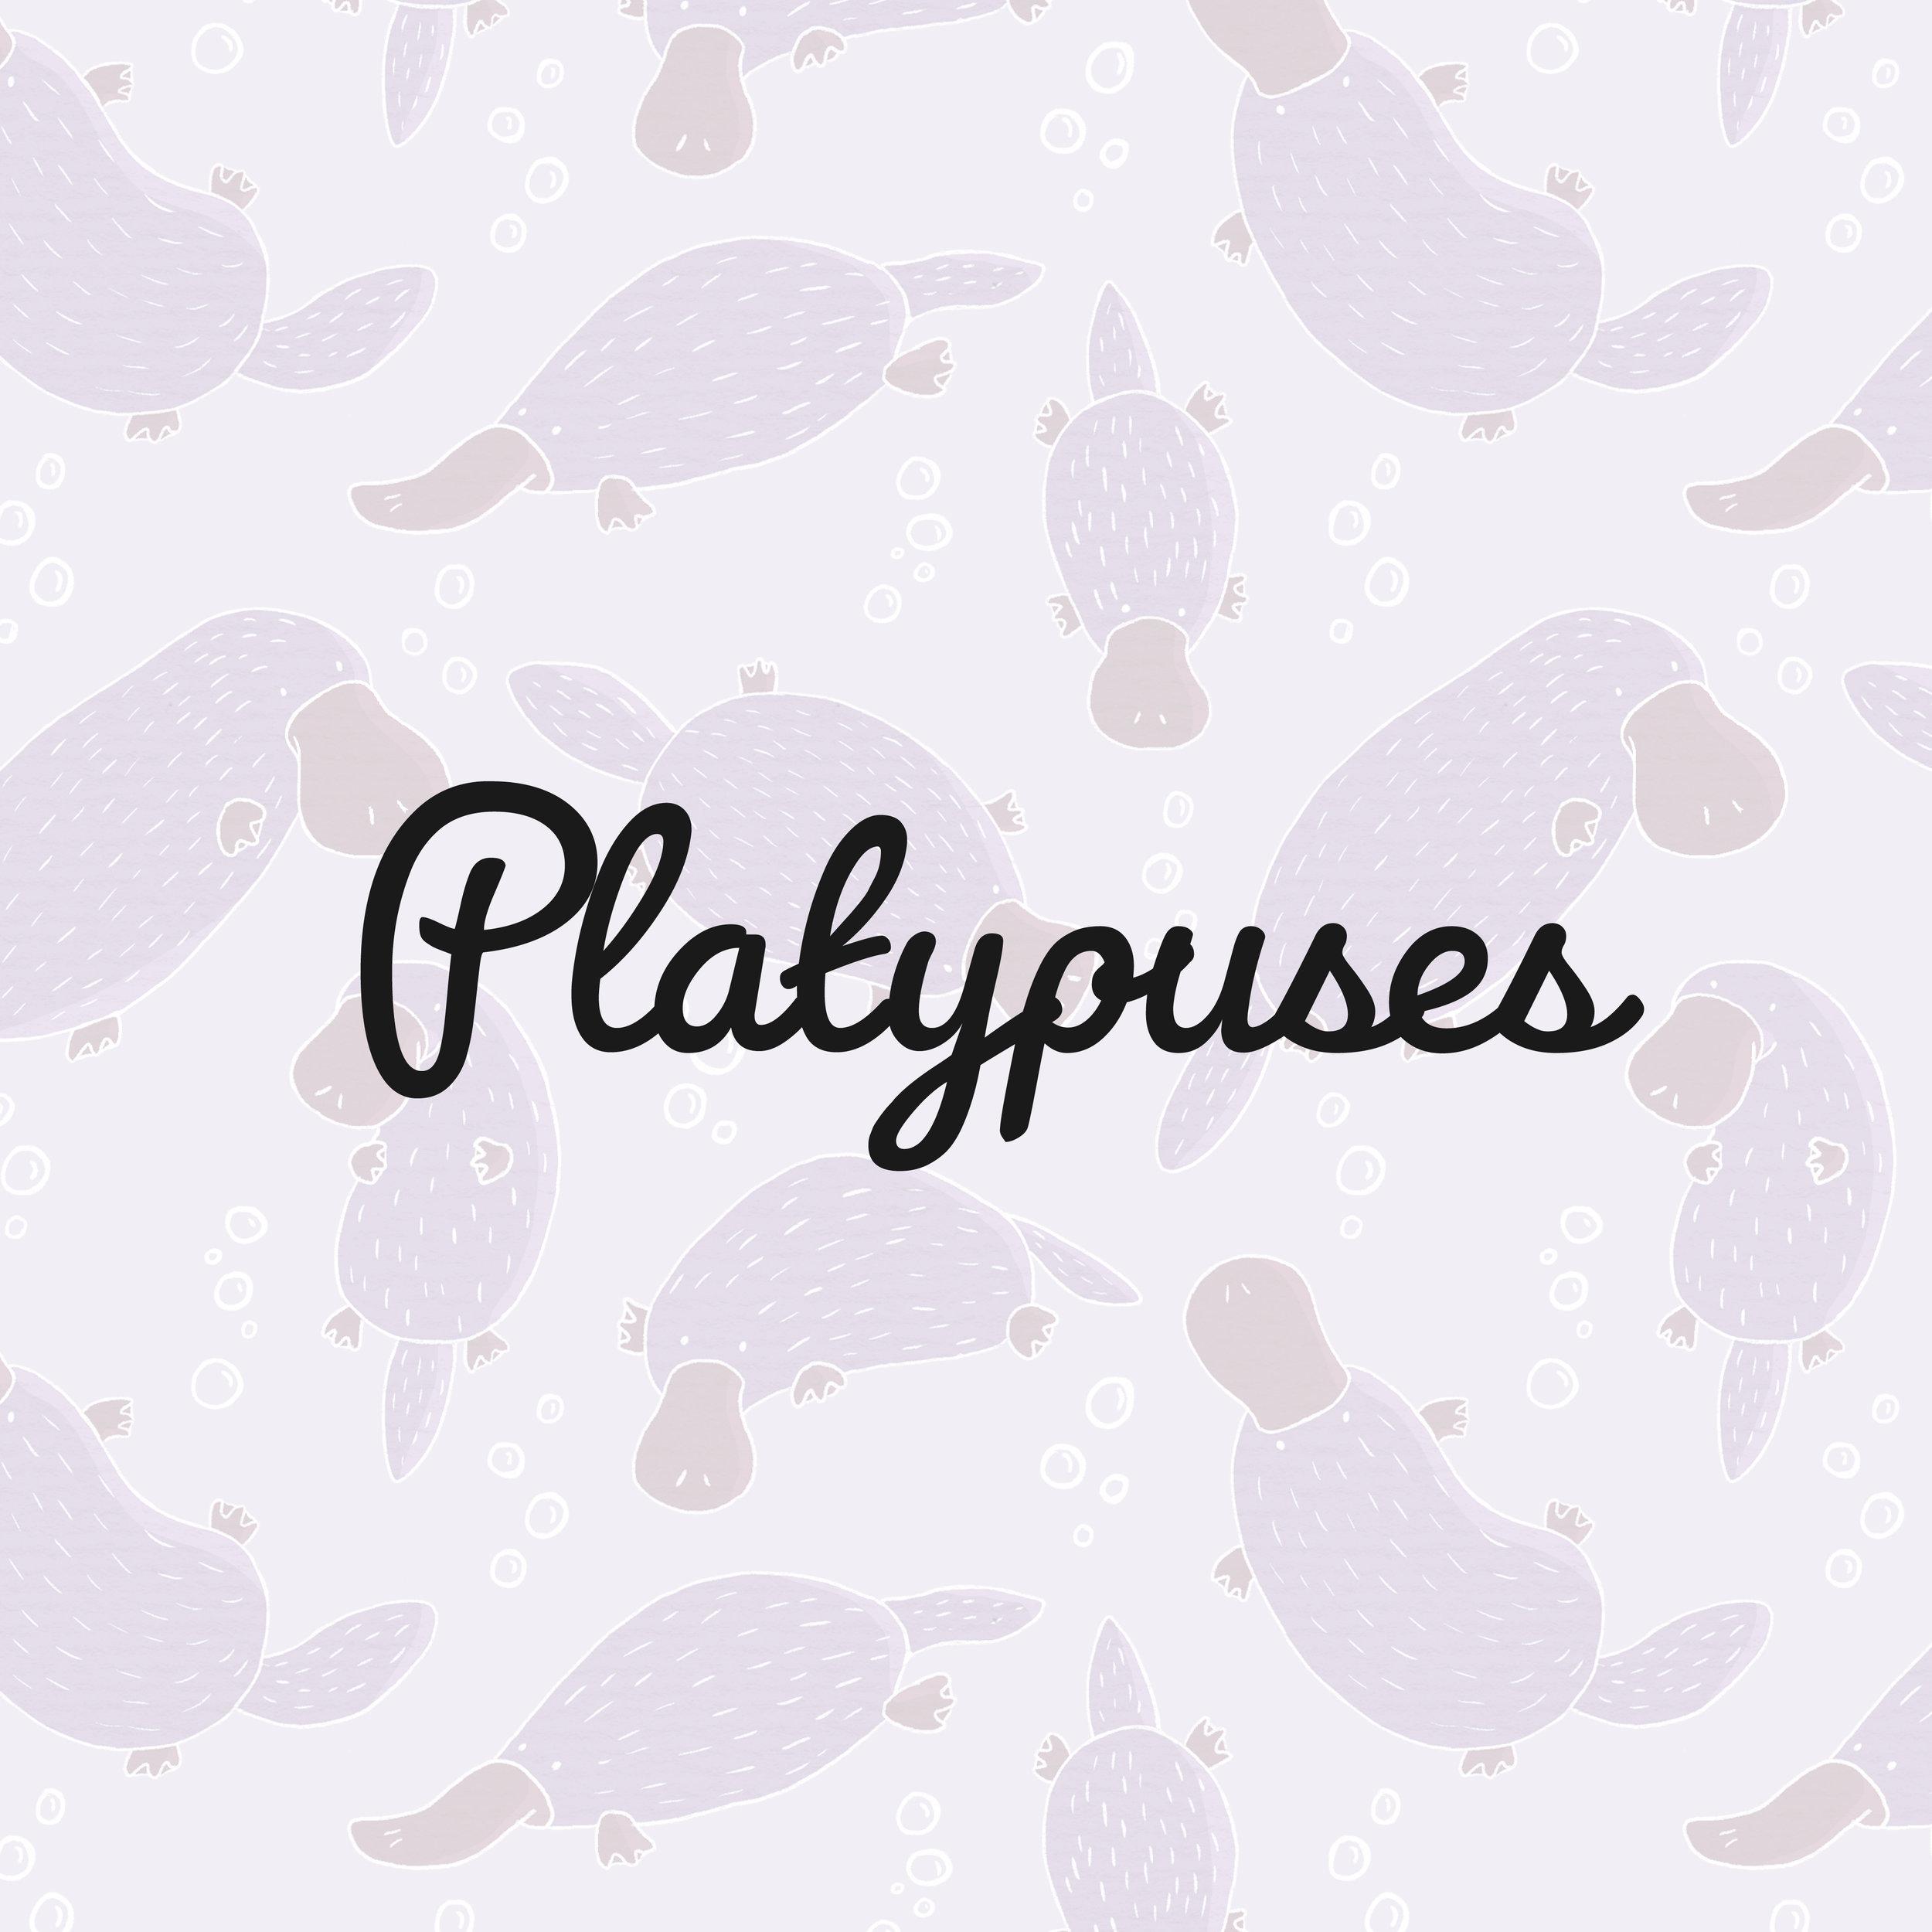 Platypus_square.jpg